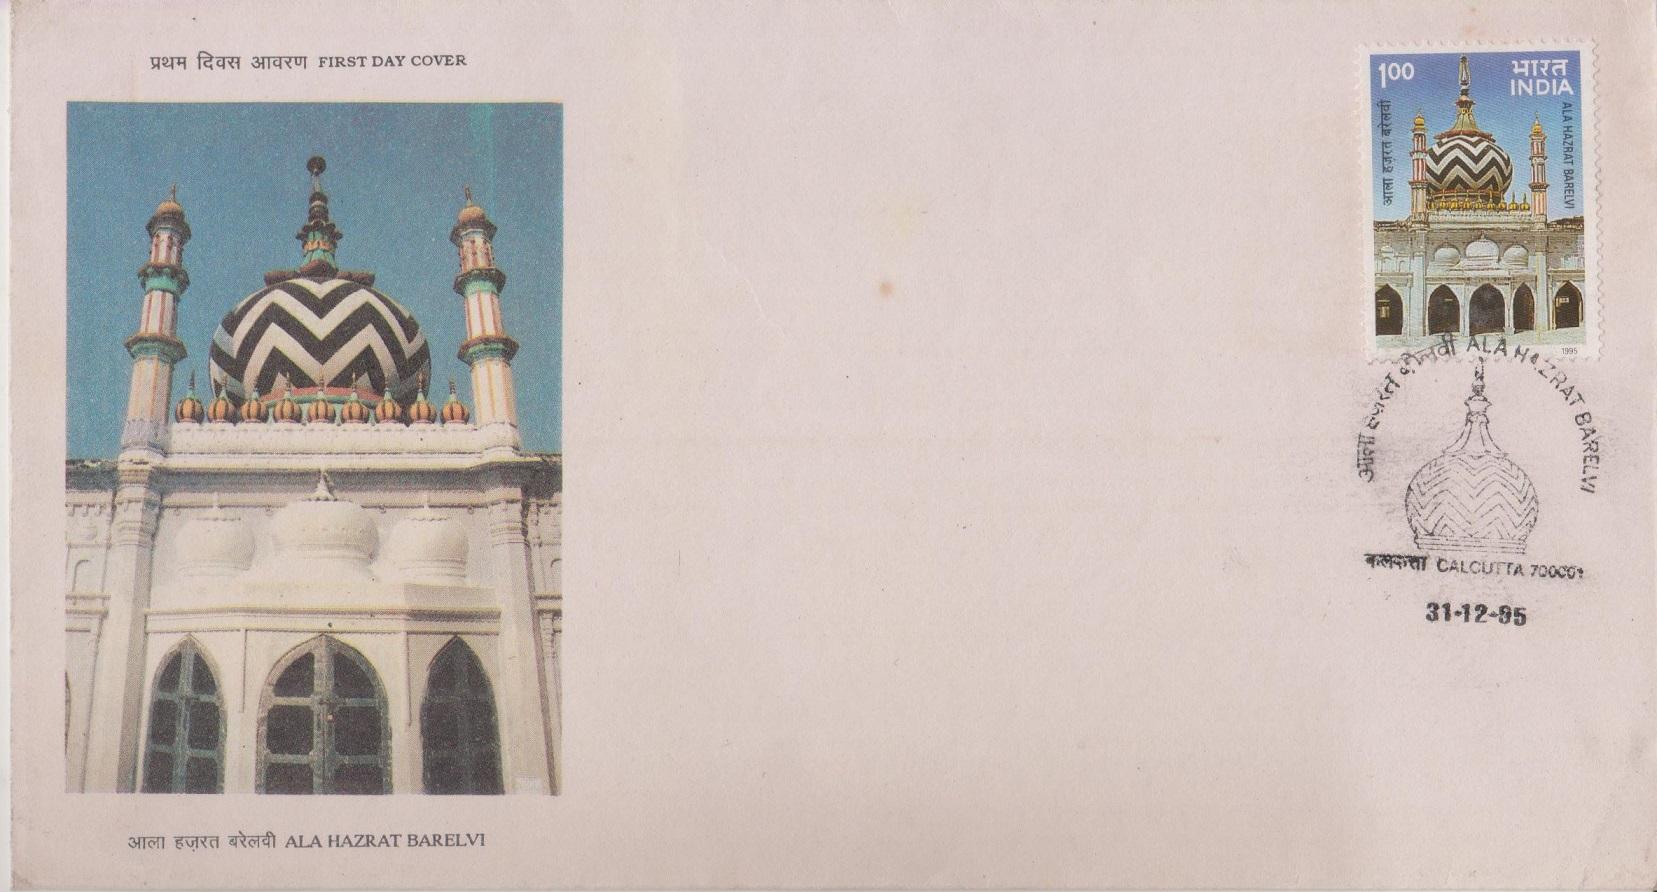 Tomb of Dargah-e-Ala Hazrat Barelvi (Ahmed Rida Khan)